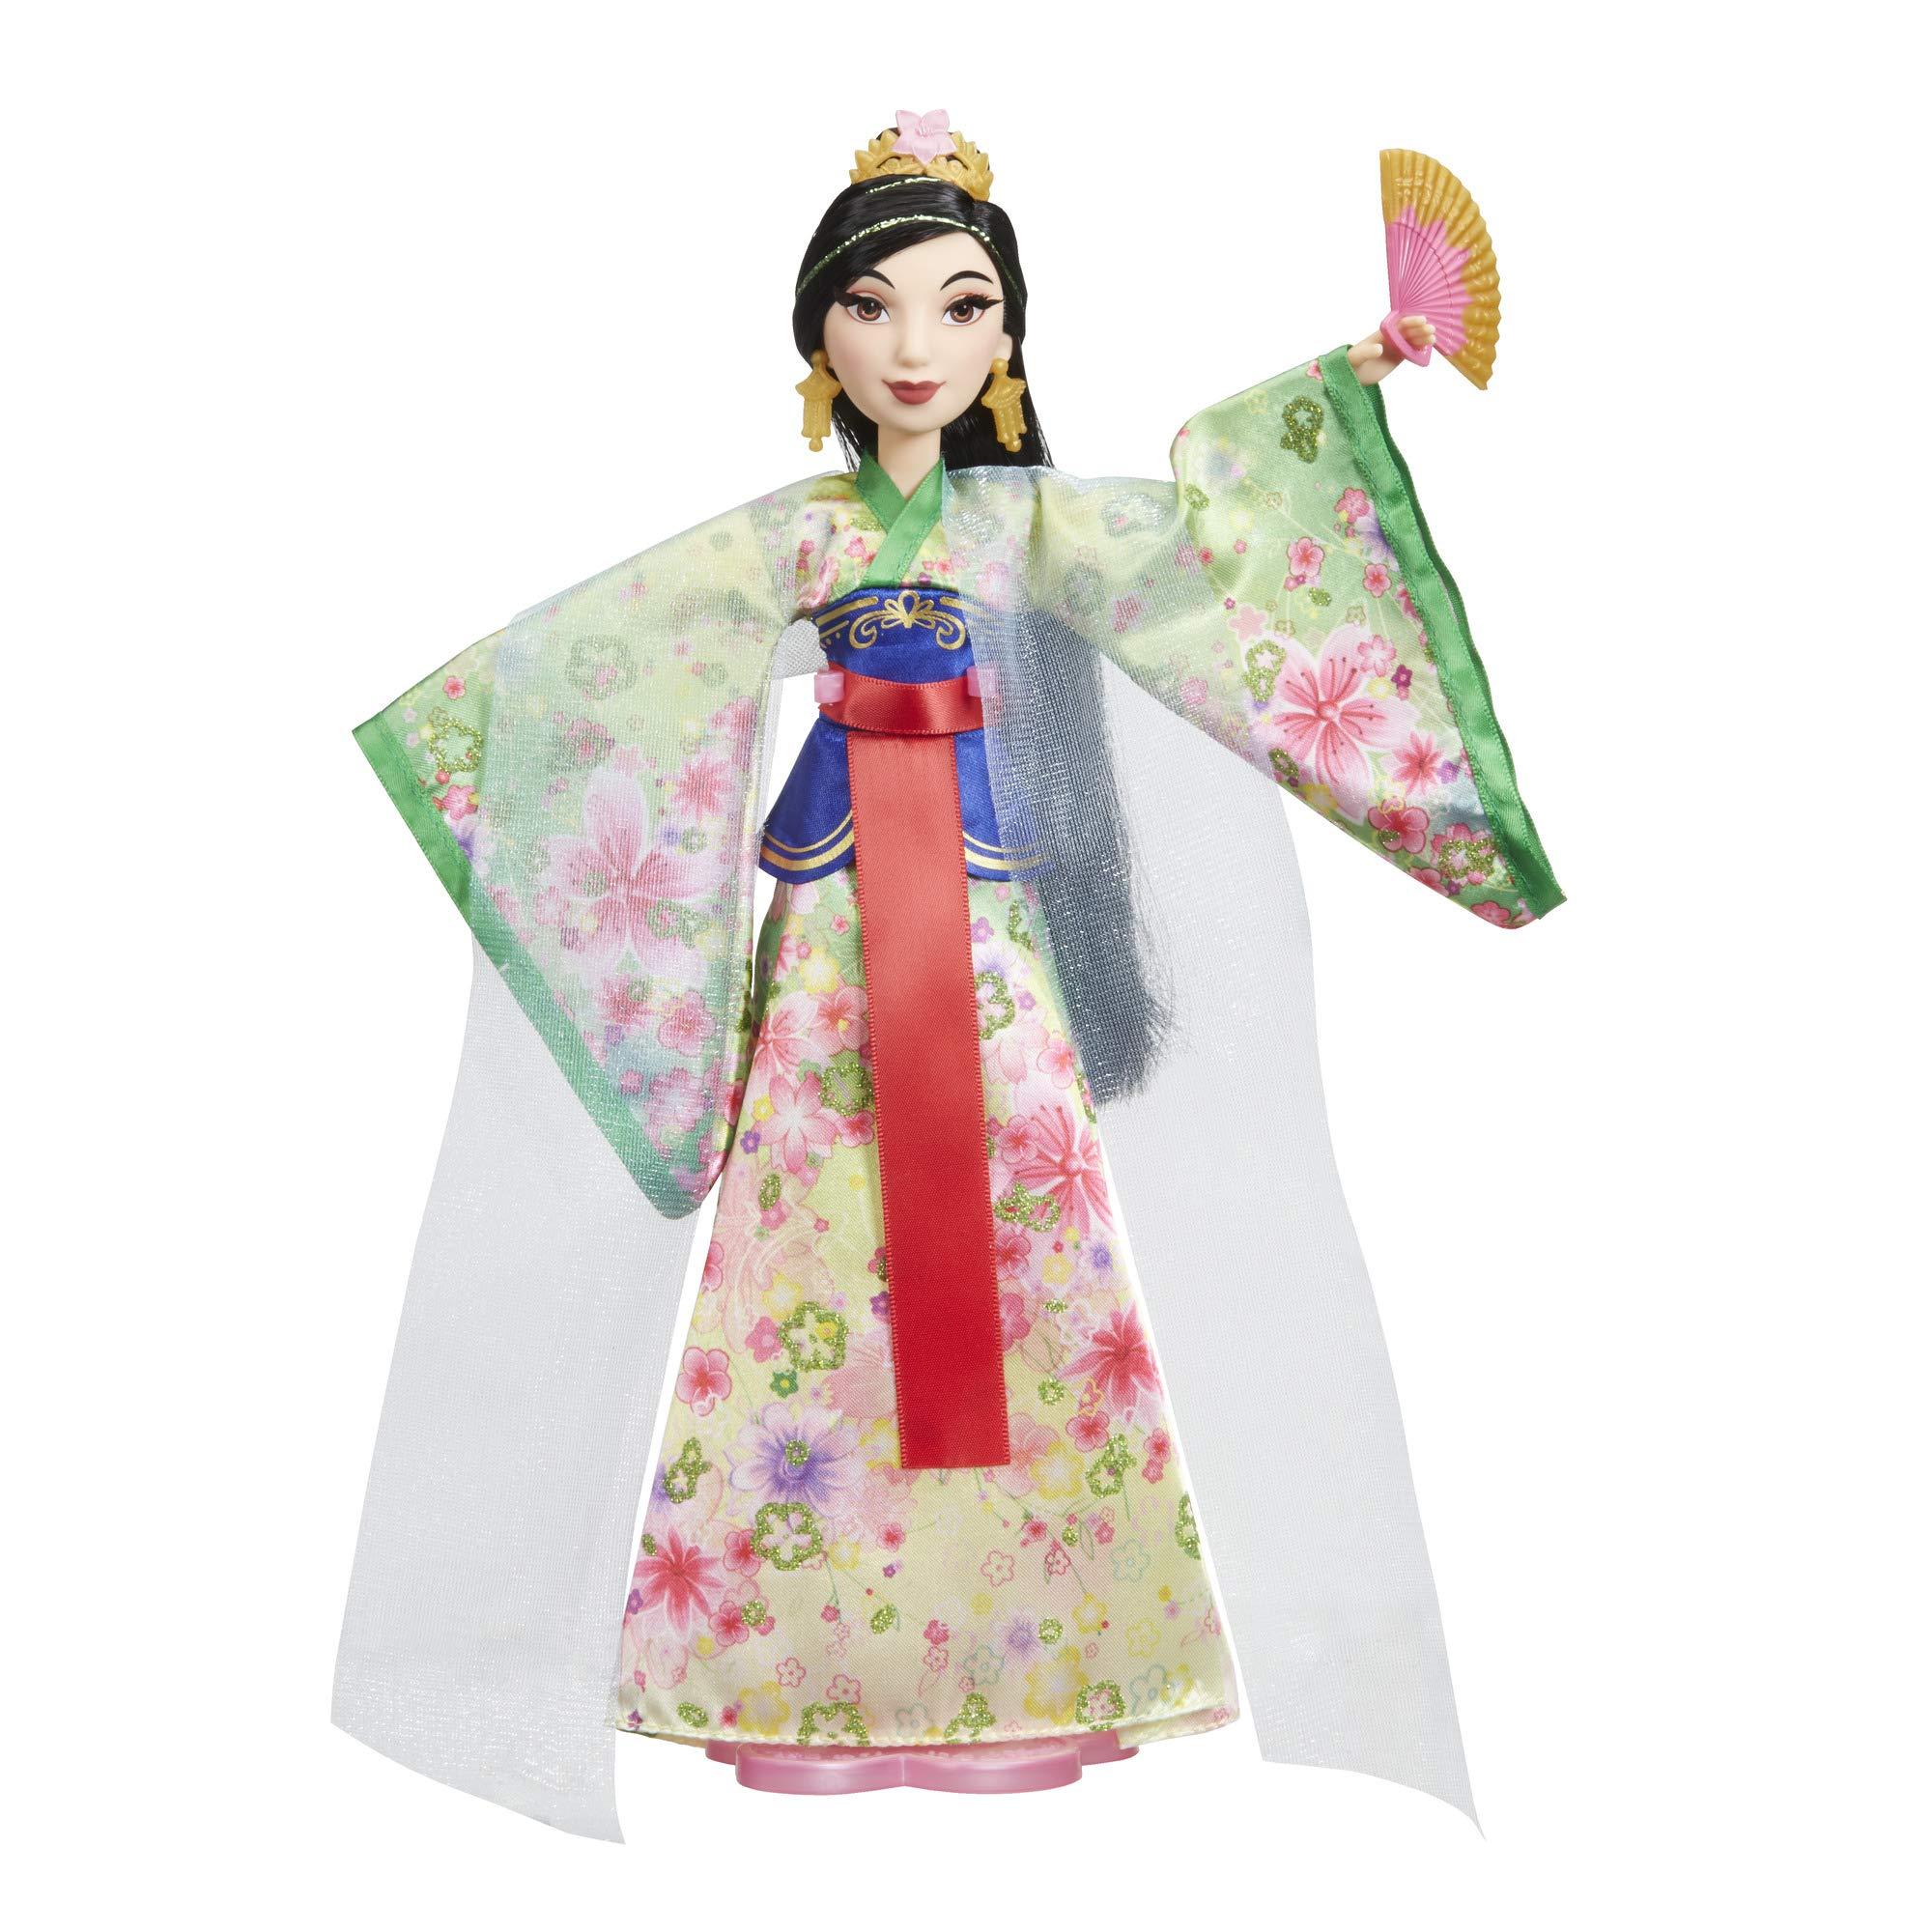 Disney Princess Royal Collection Deluxe Mulan (Amazon Exclusive)